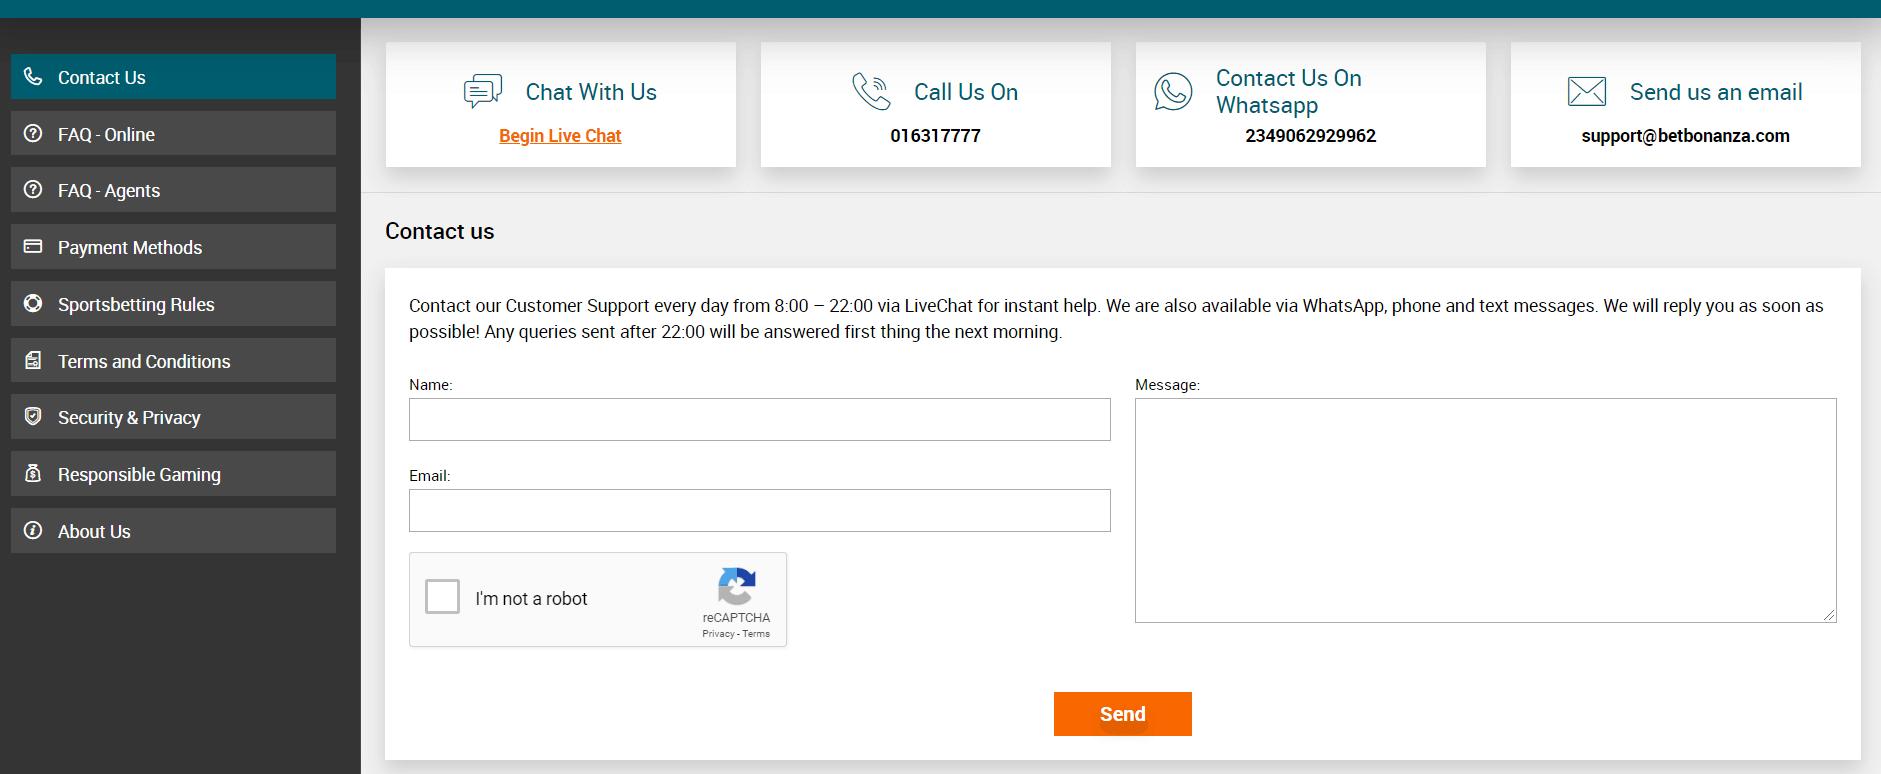 Betbonanza customer service contact information